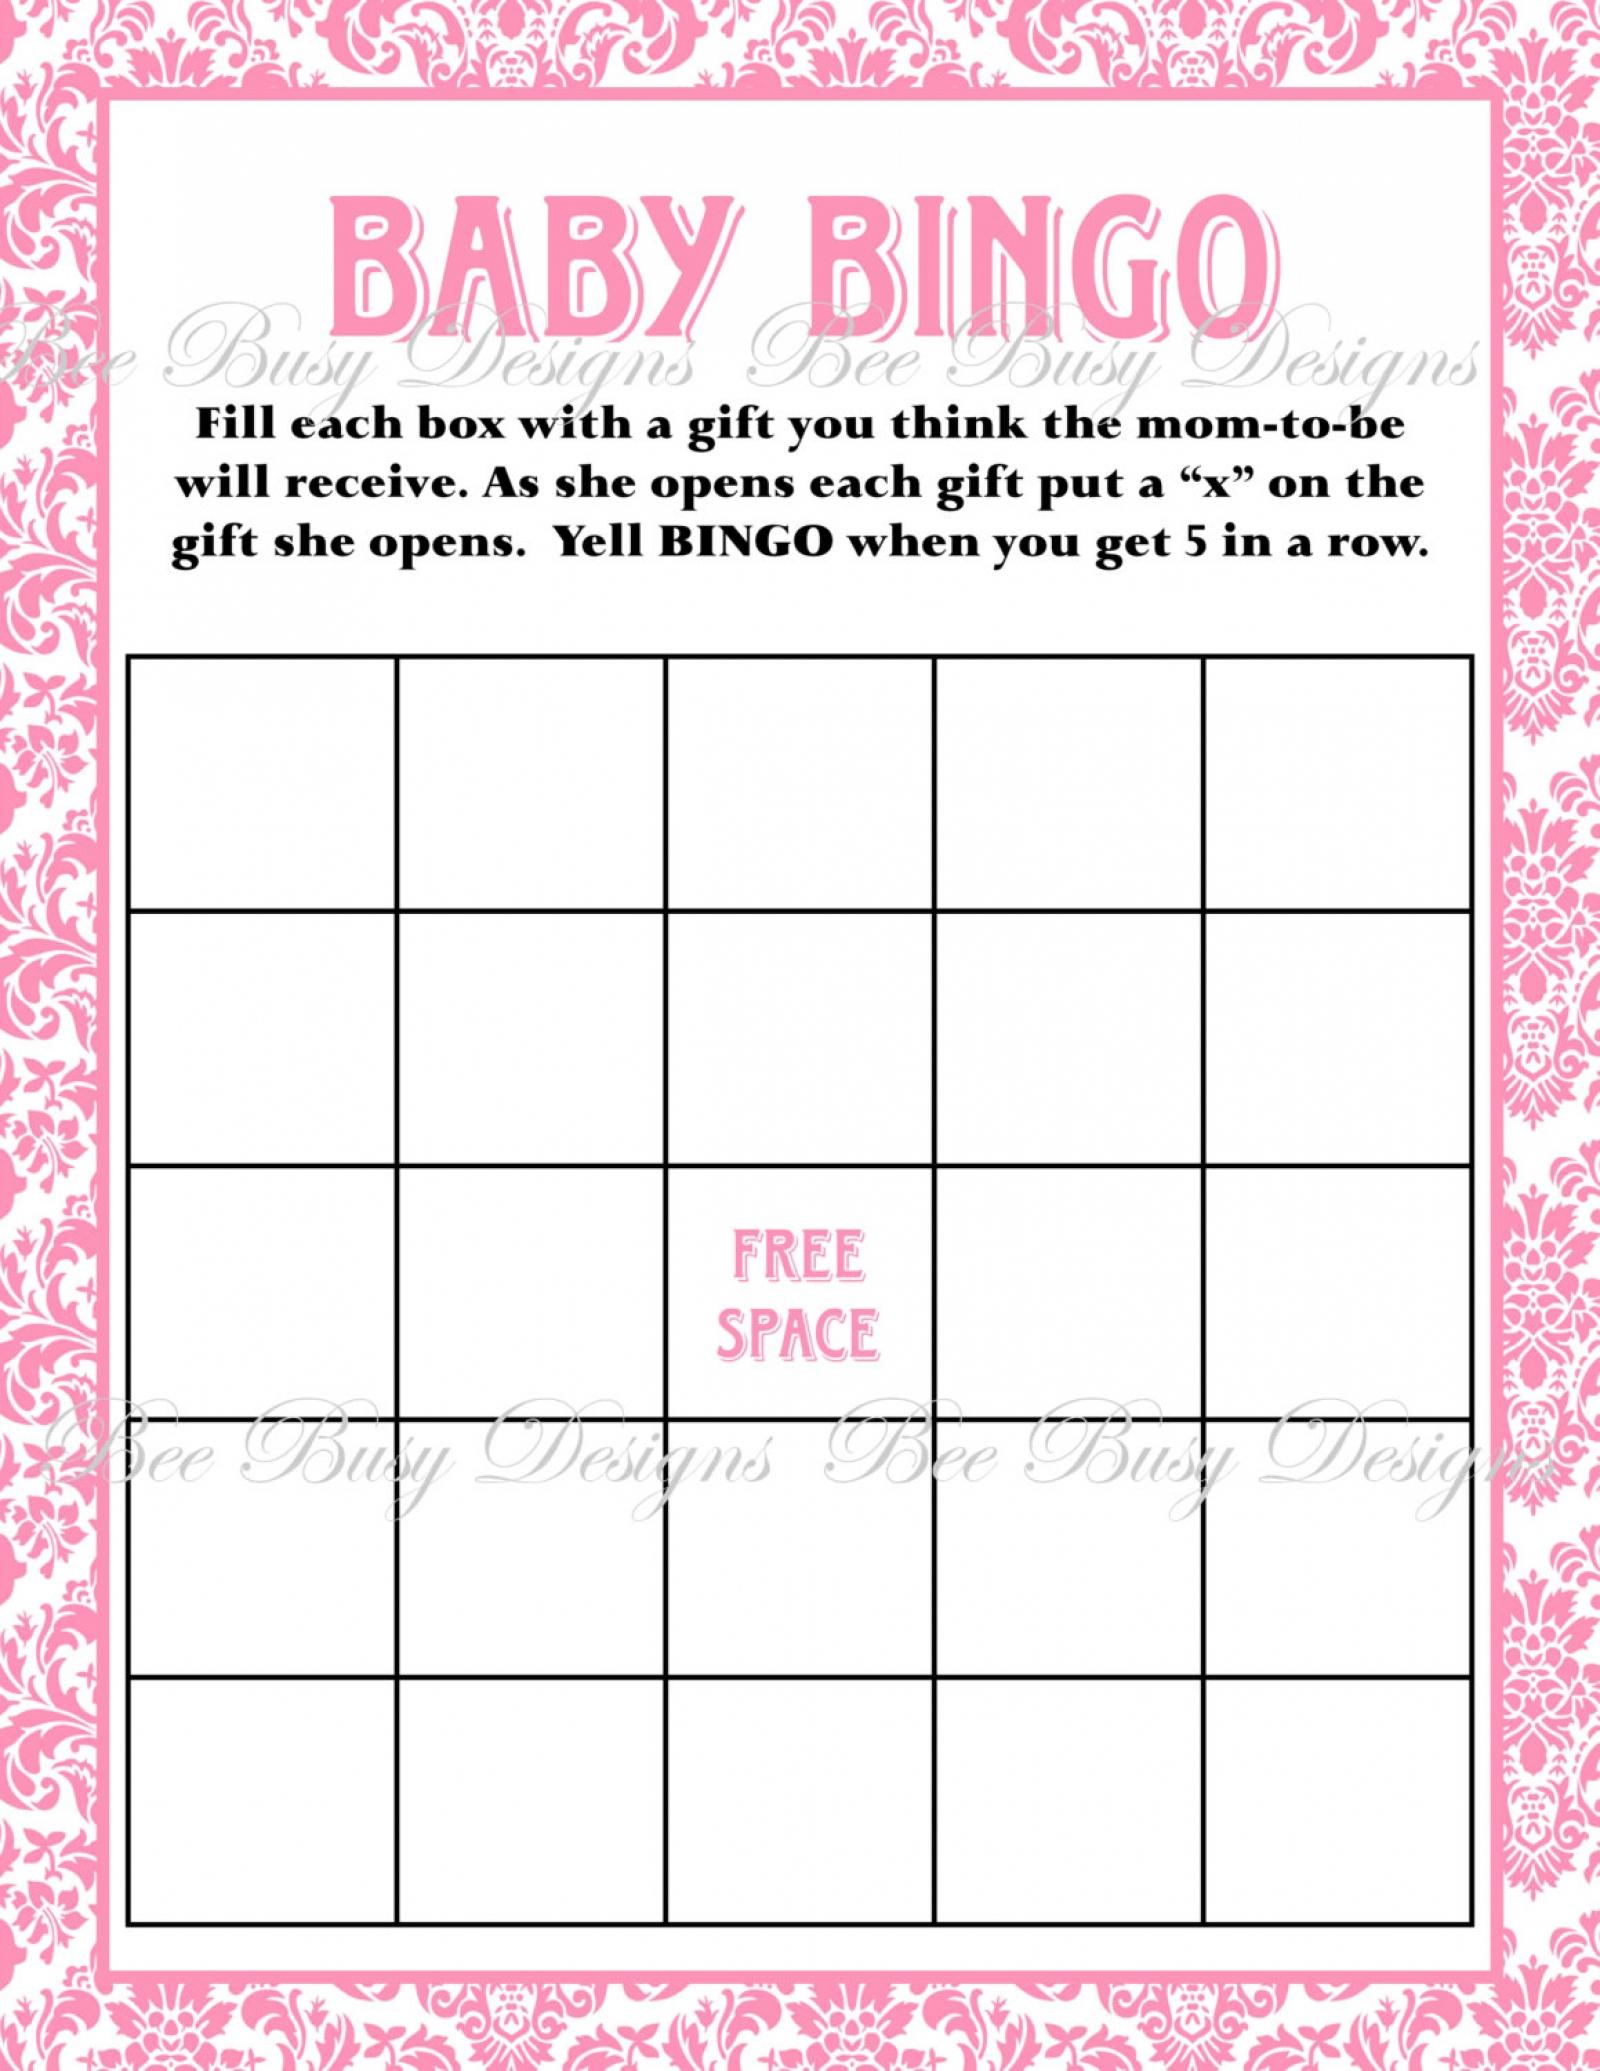 Printable Pink Damask Baby Shower Bingo Game Instant Download   Bee - Free Printable Baby Shower Bingo Cards